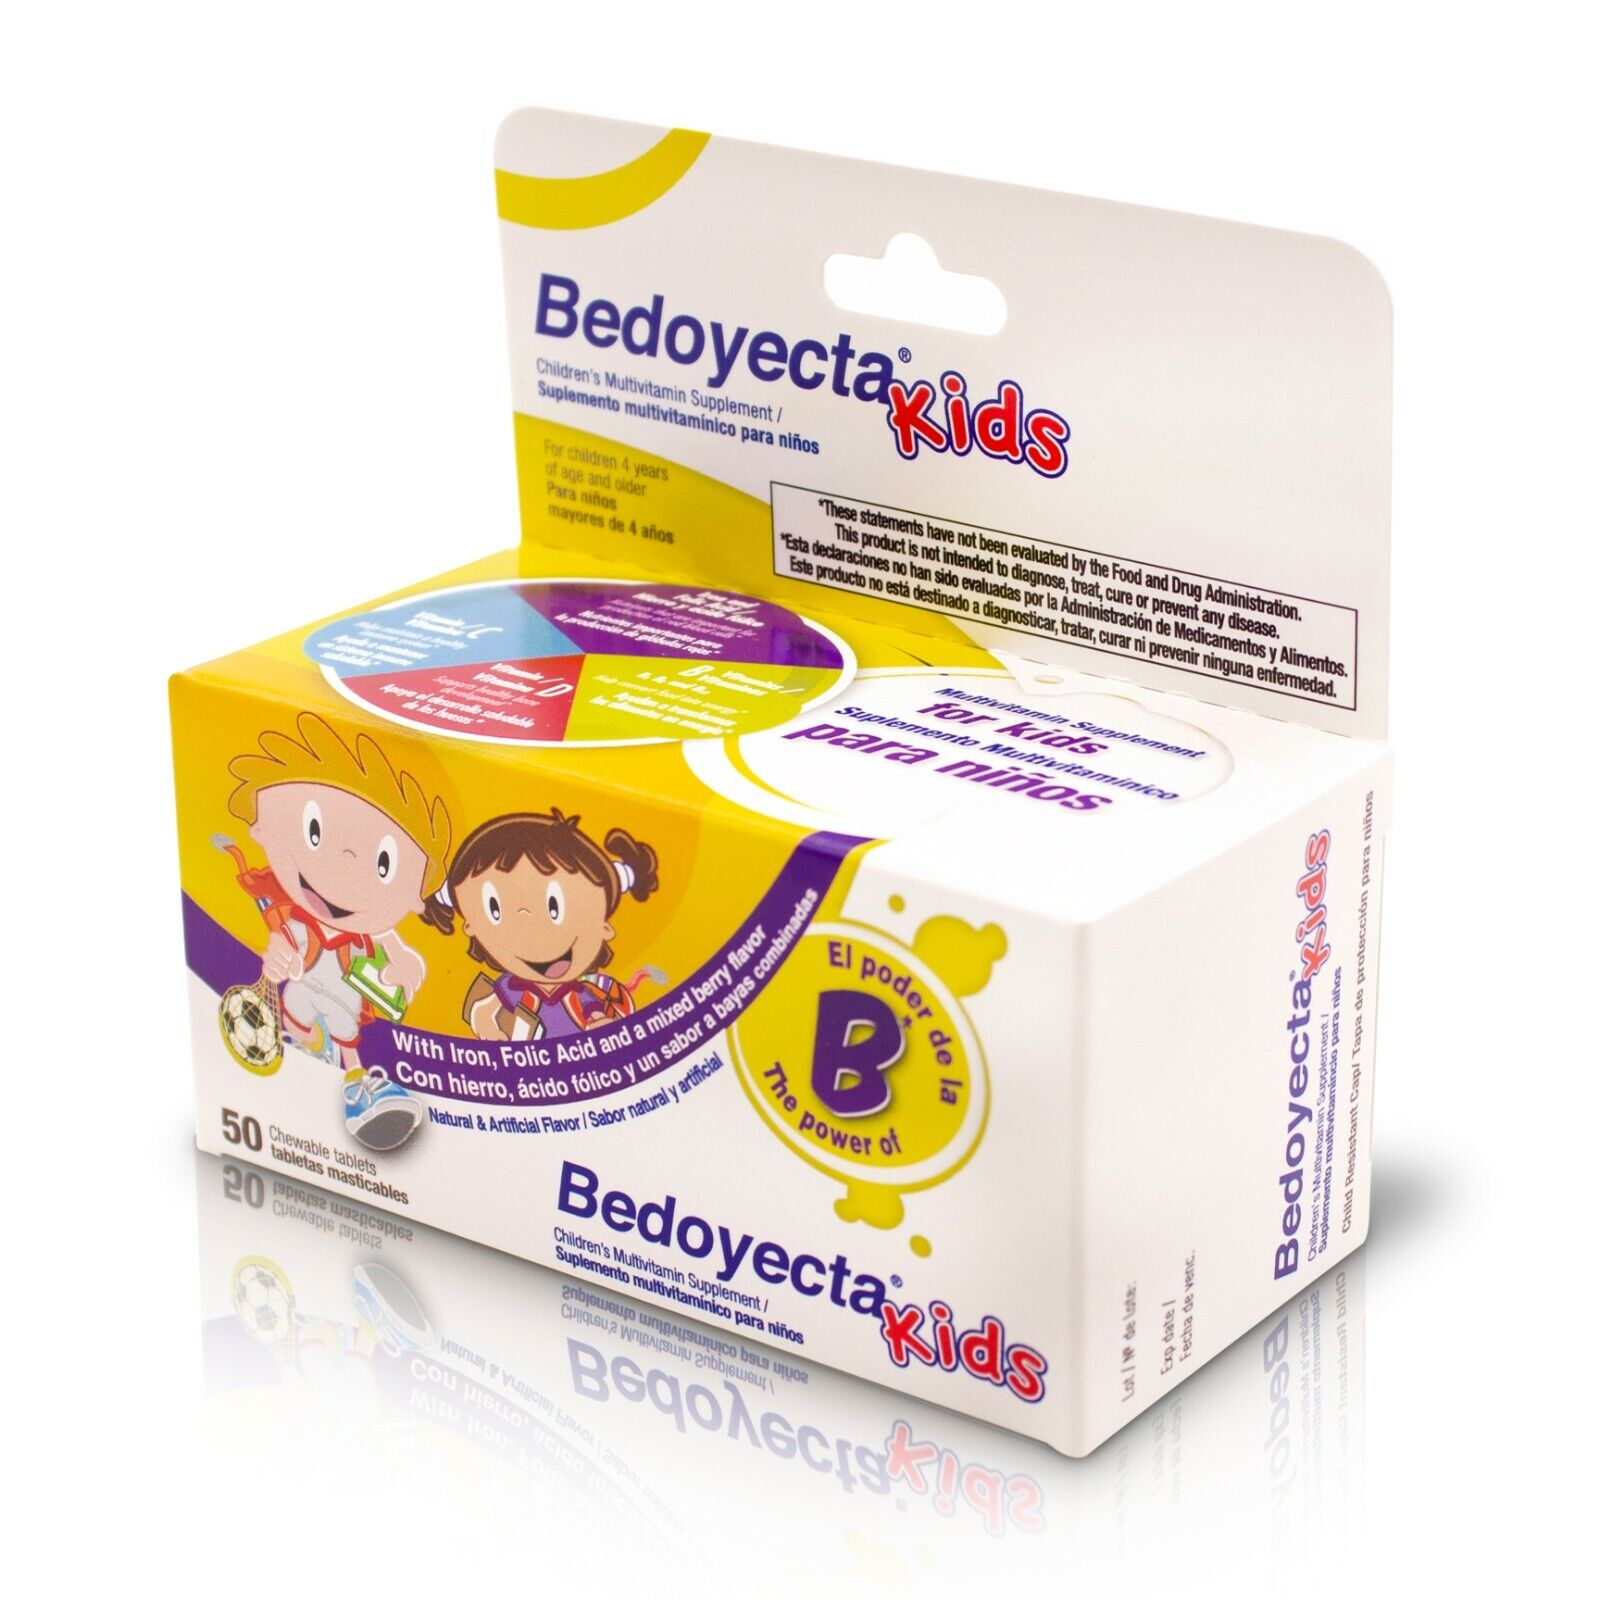 BEDOYECTA KIDS 50 TAB CHEWABLES / BEDOYECTA KIDS 50 TAB MASTICABLES